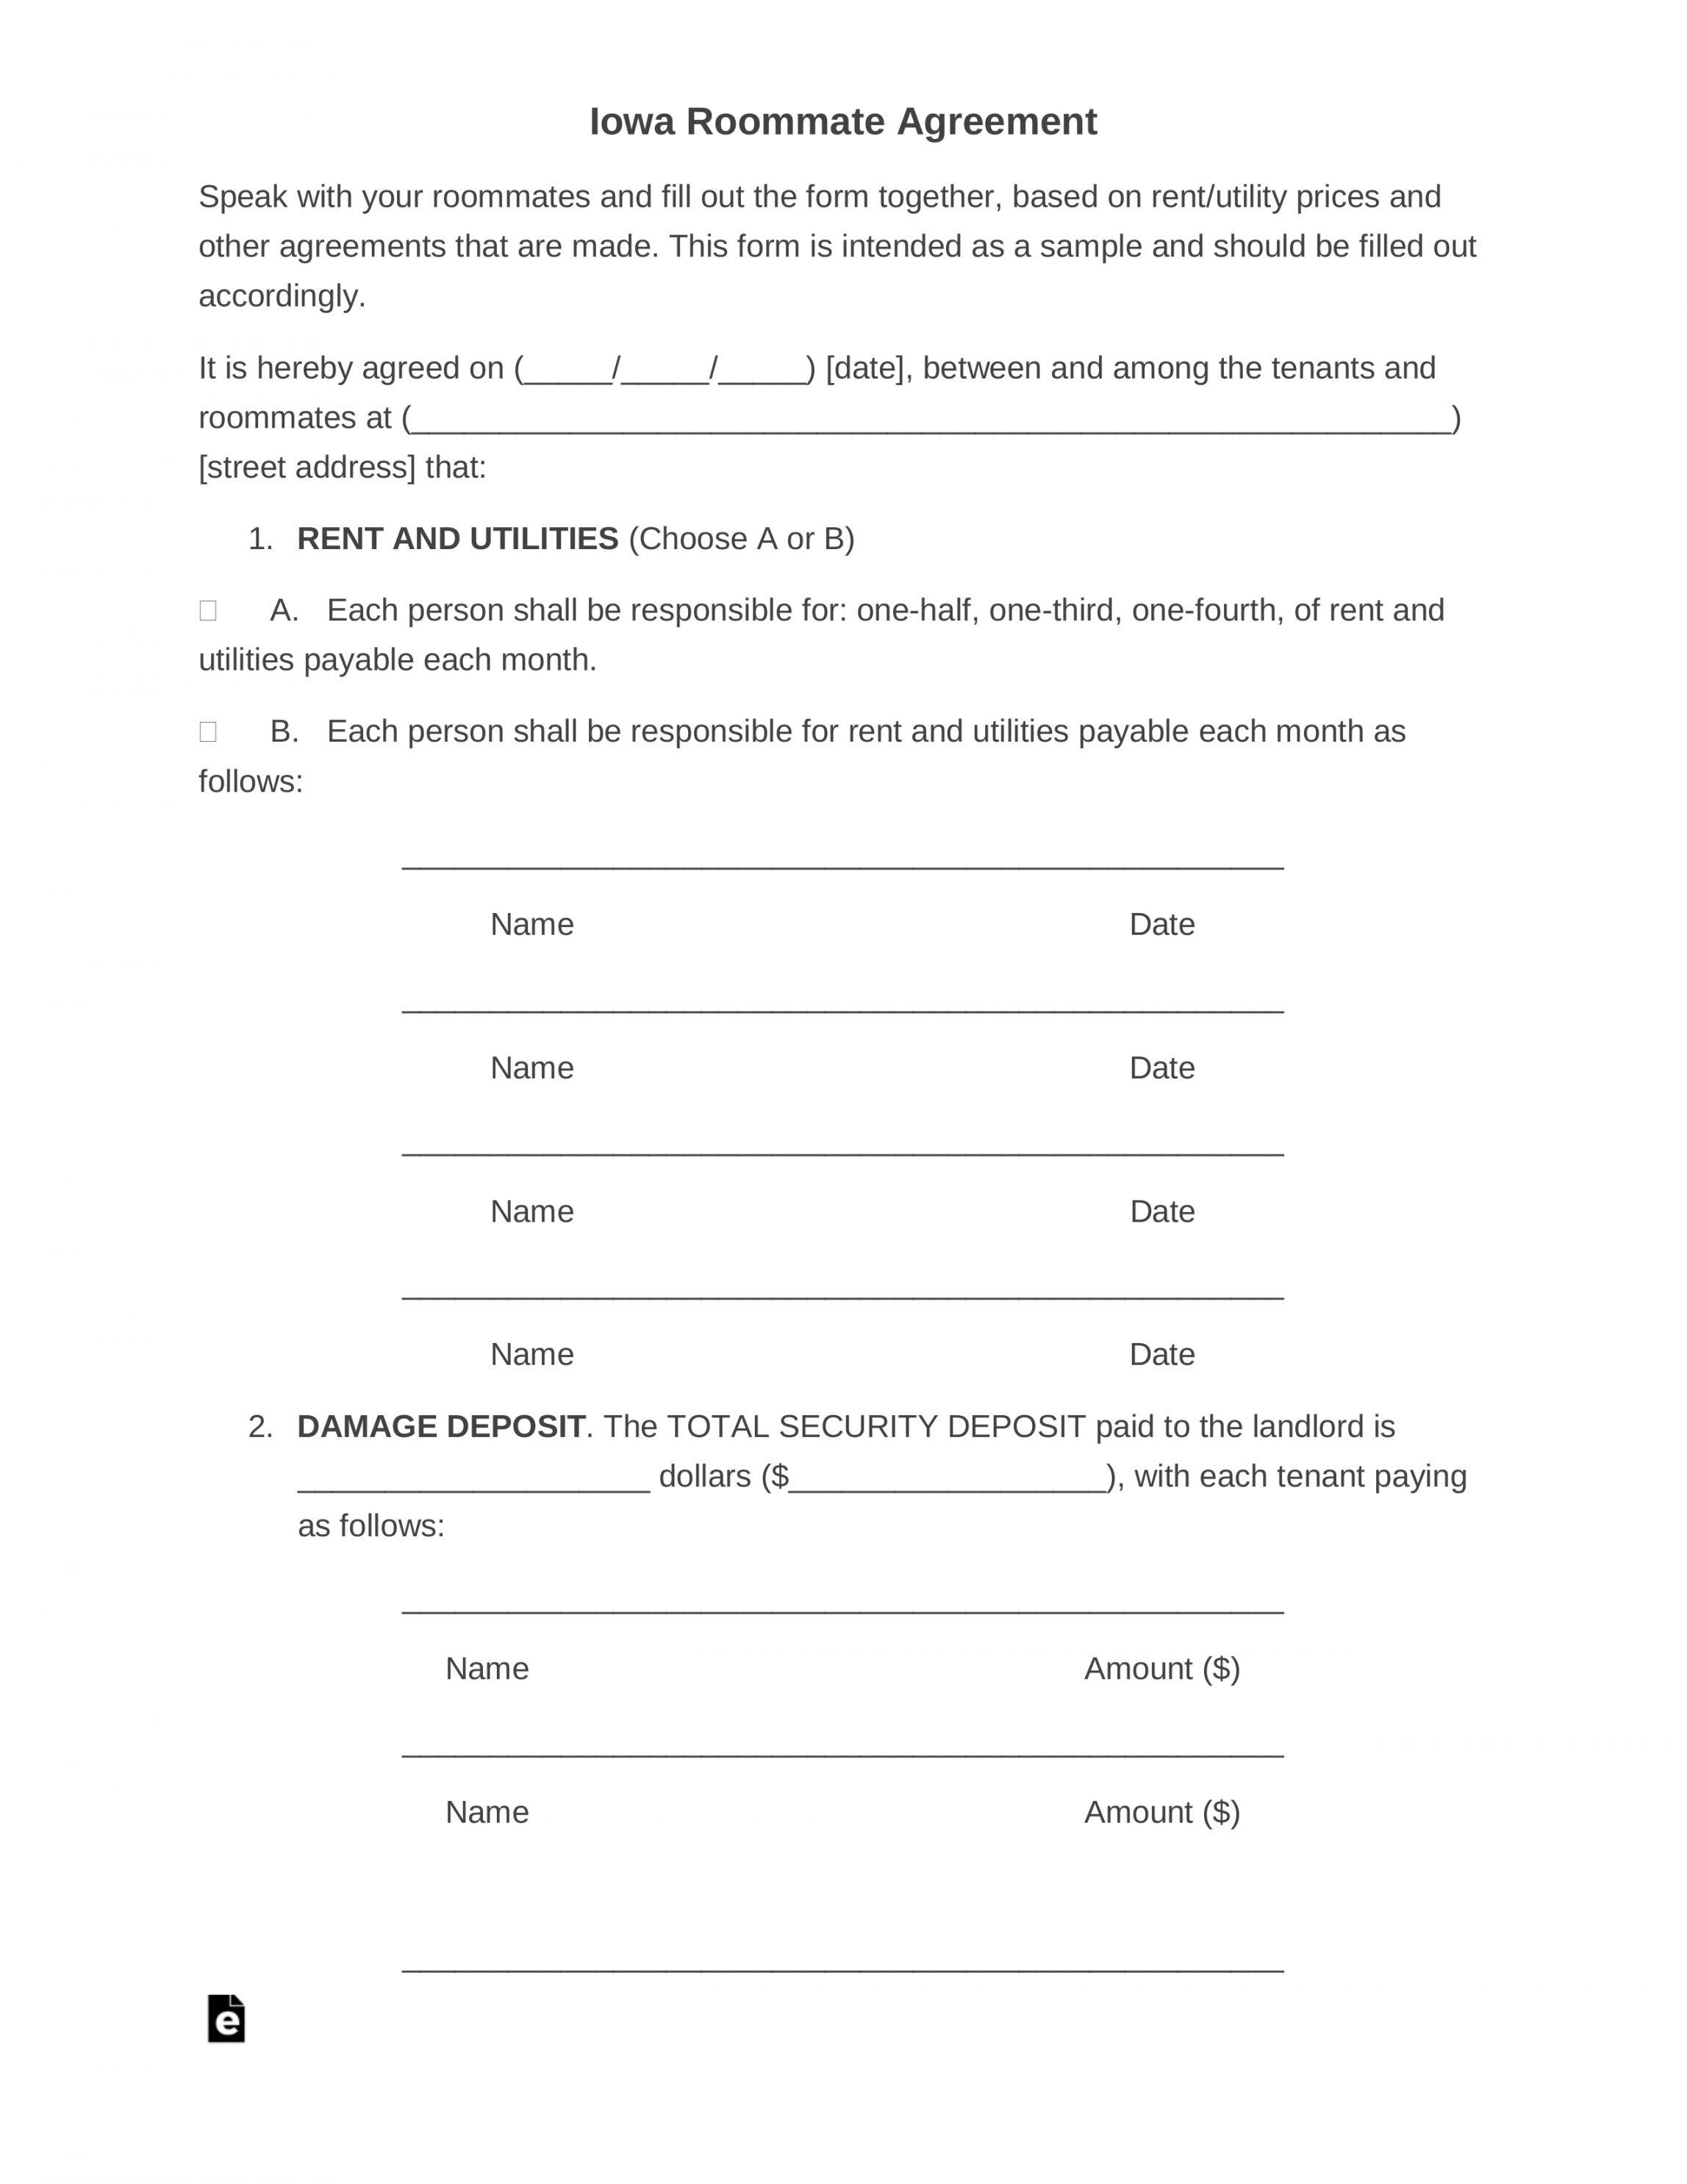 Get Our Image Of Security Deposit Agreement Between Roommates Room Rental Agreement Roommate Agreement Roommate